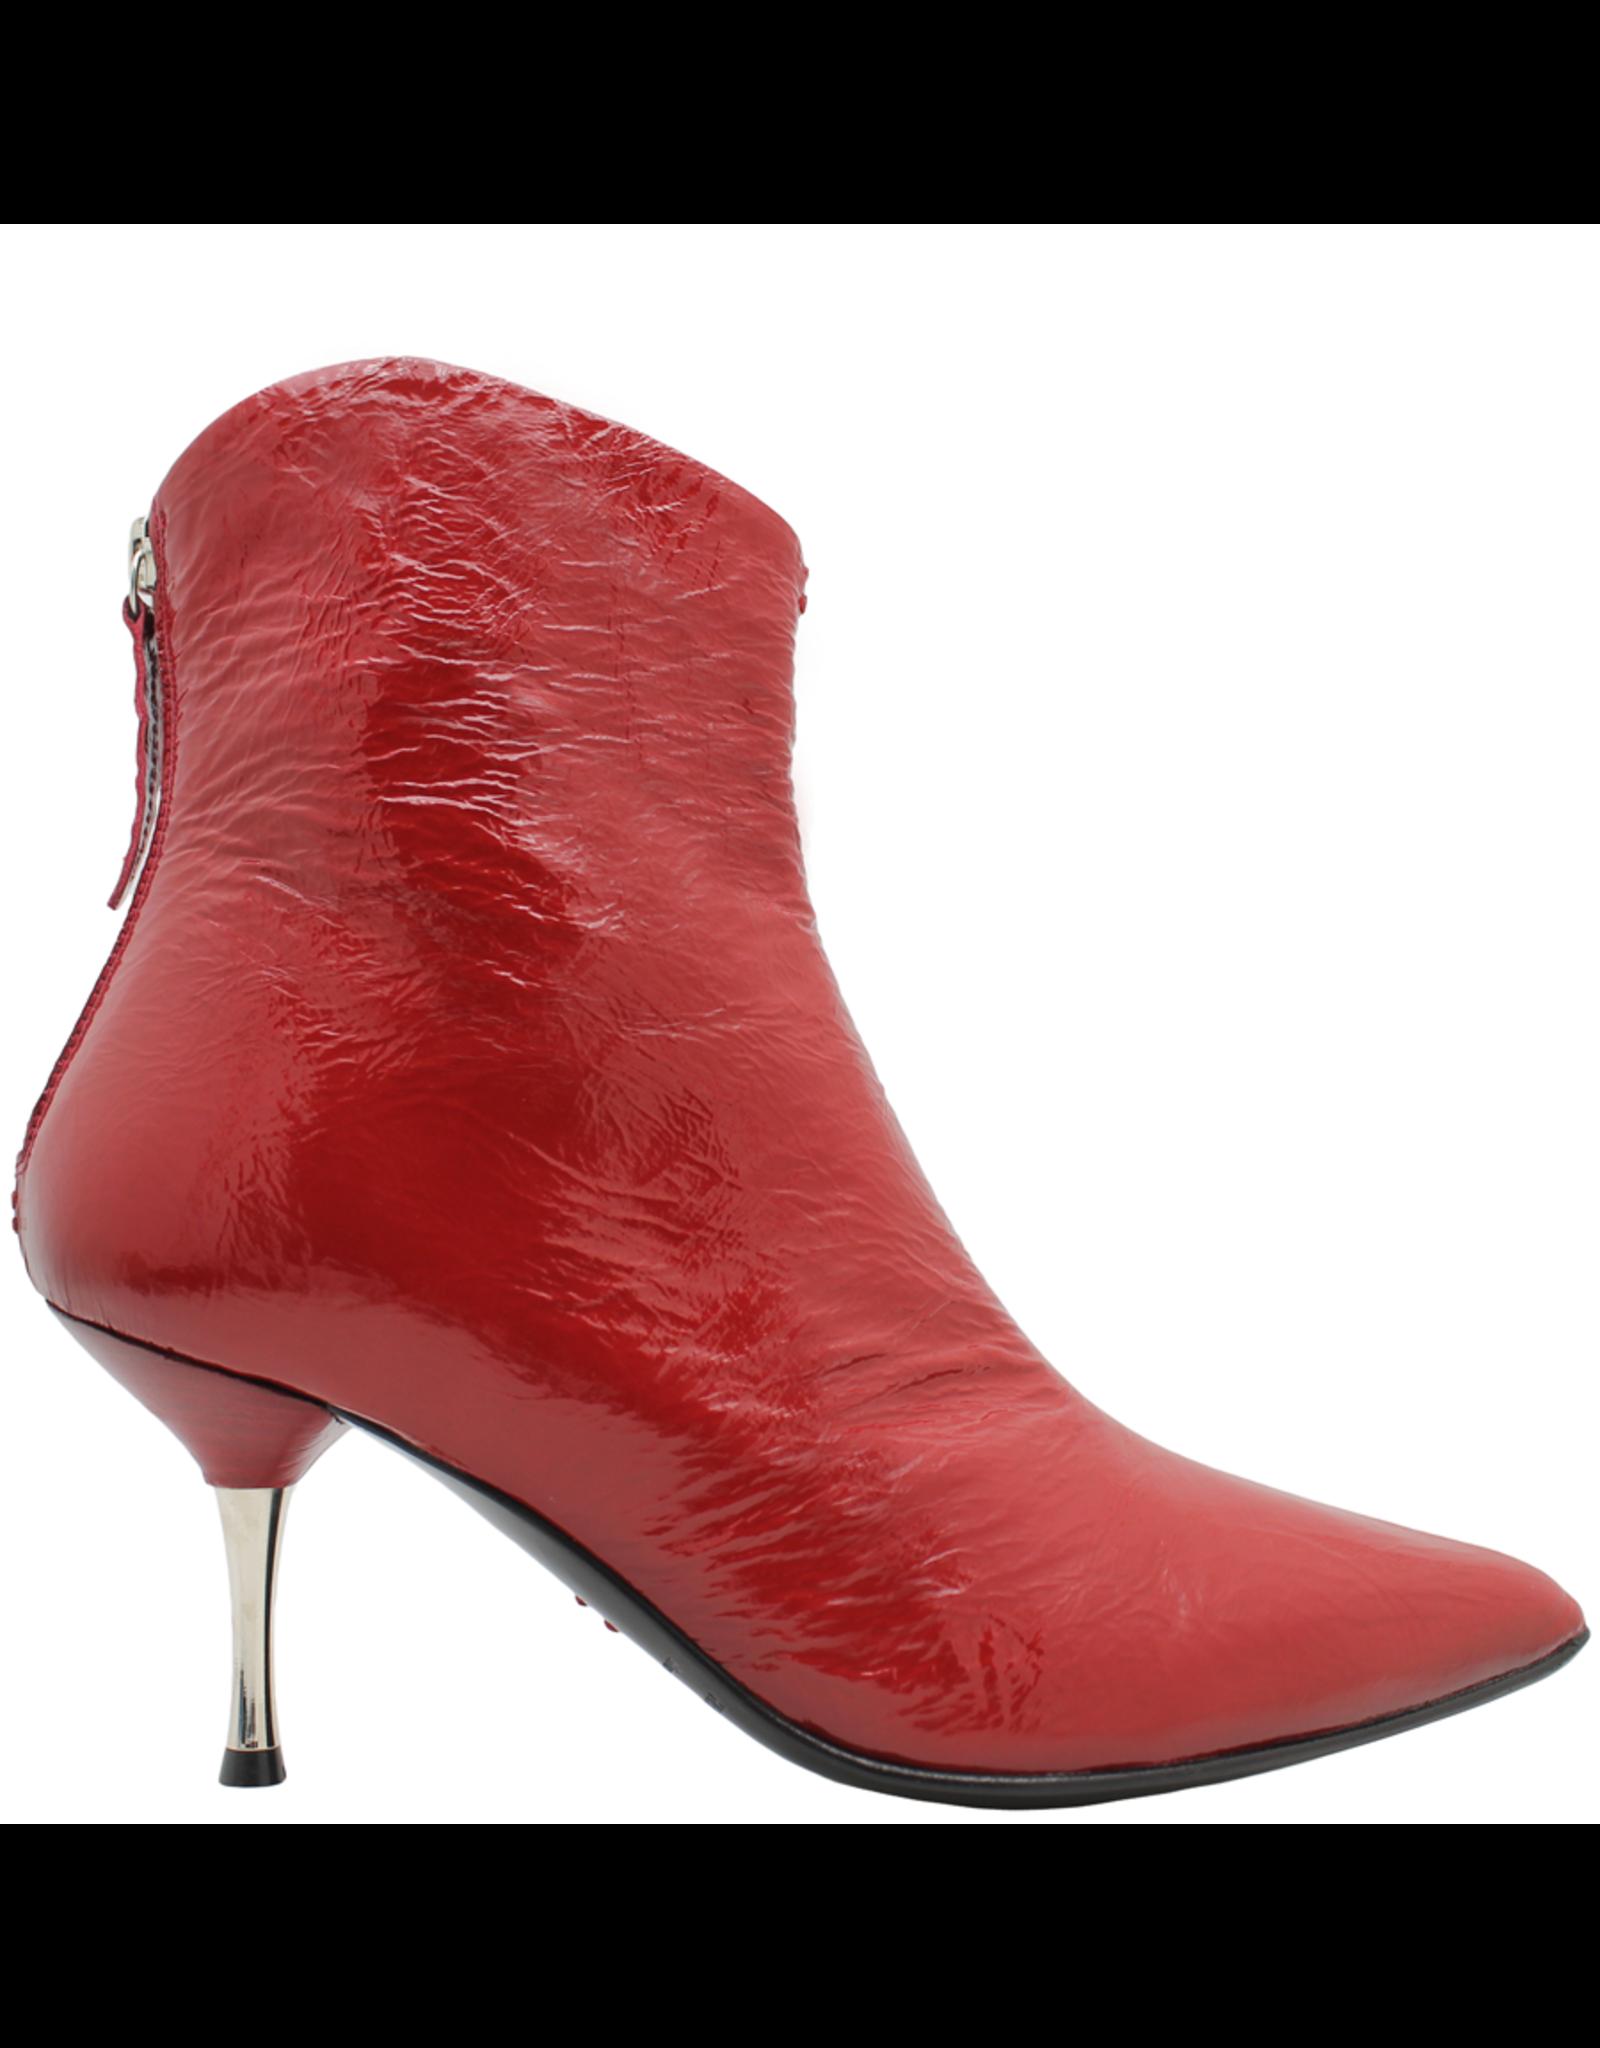 Halmanera Halmanera Red Patent Boot 1996